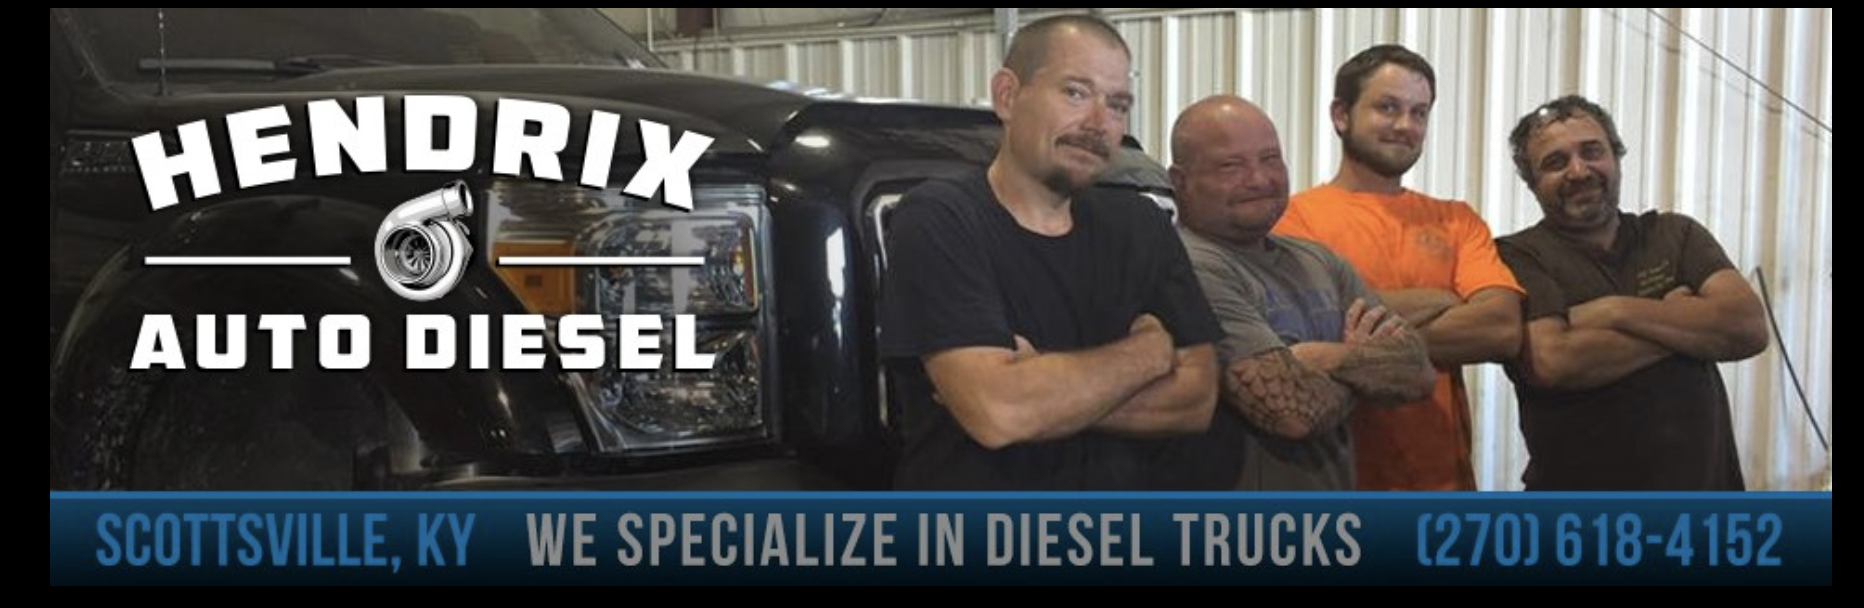 Hendrix Auto Diesel image 1